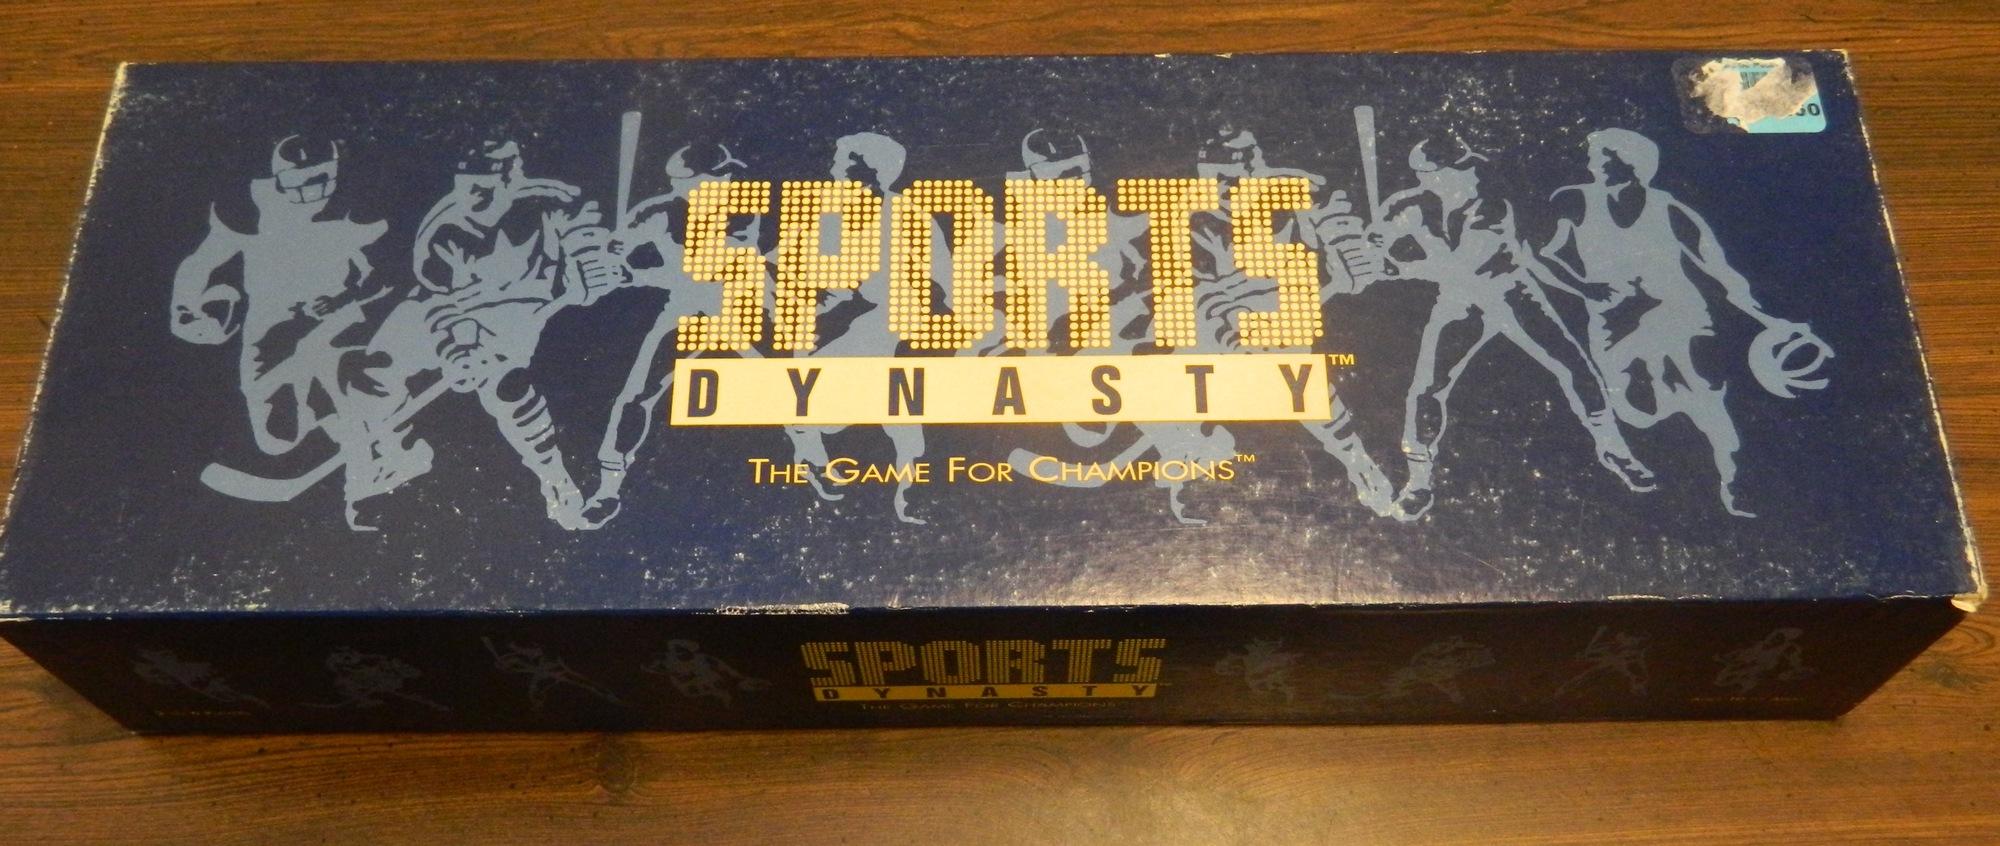 Box for Sports Dynasty